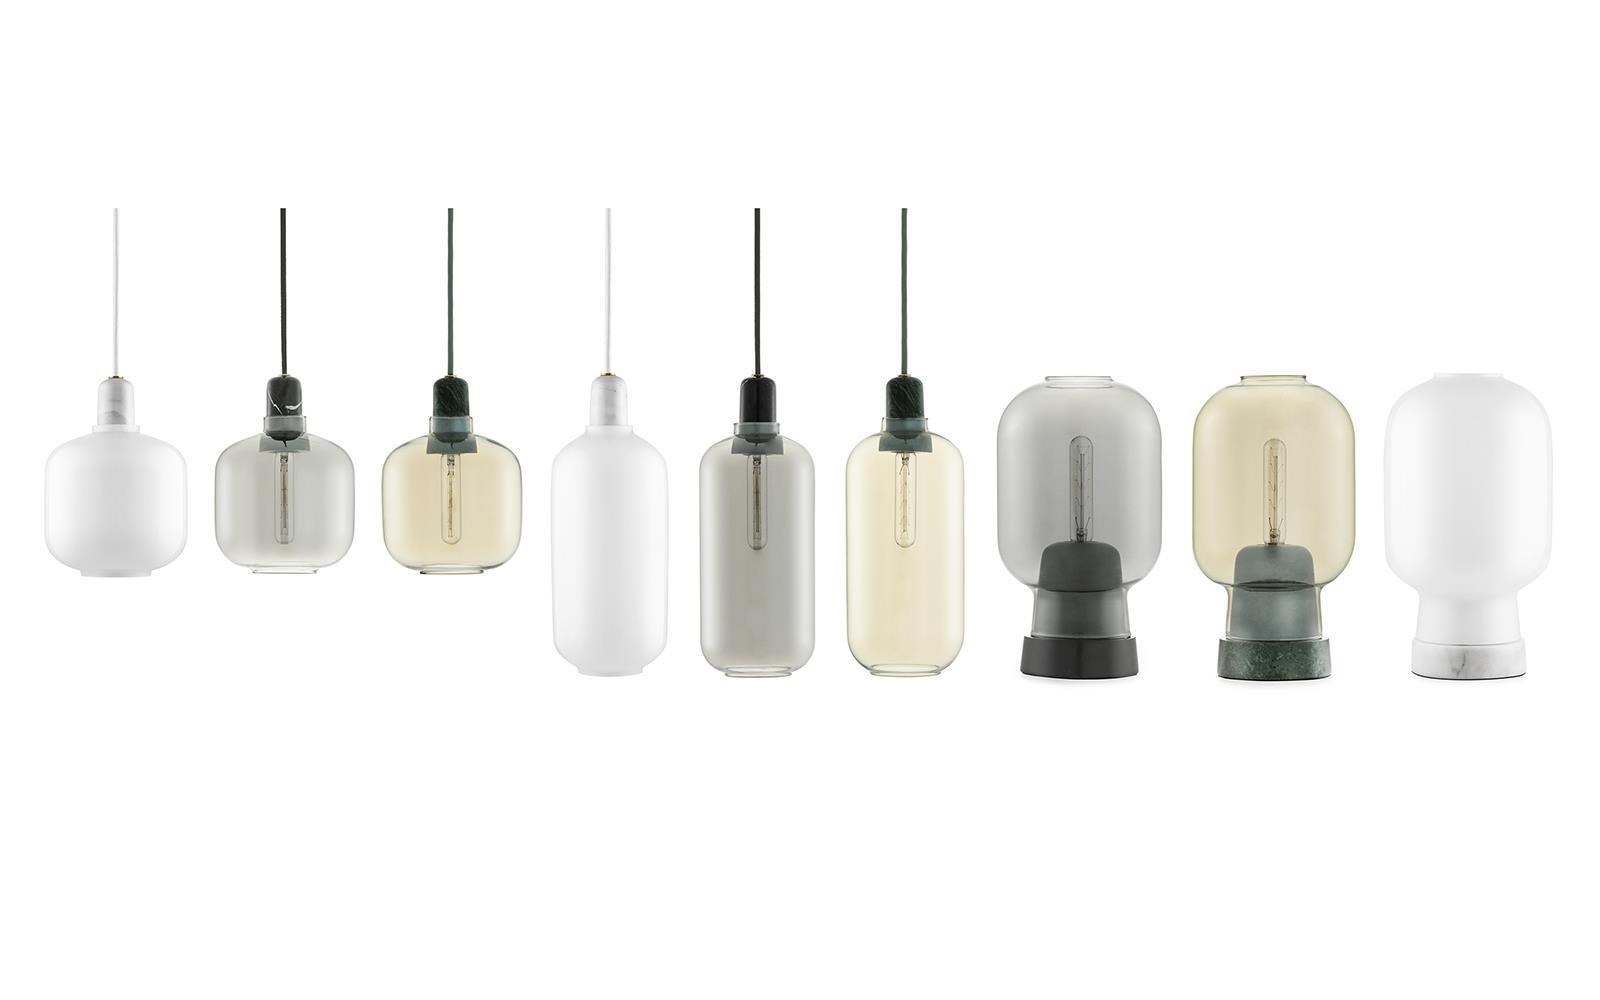 Amp lamp white/brass Large